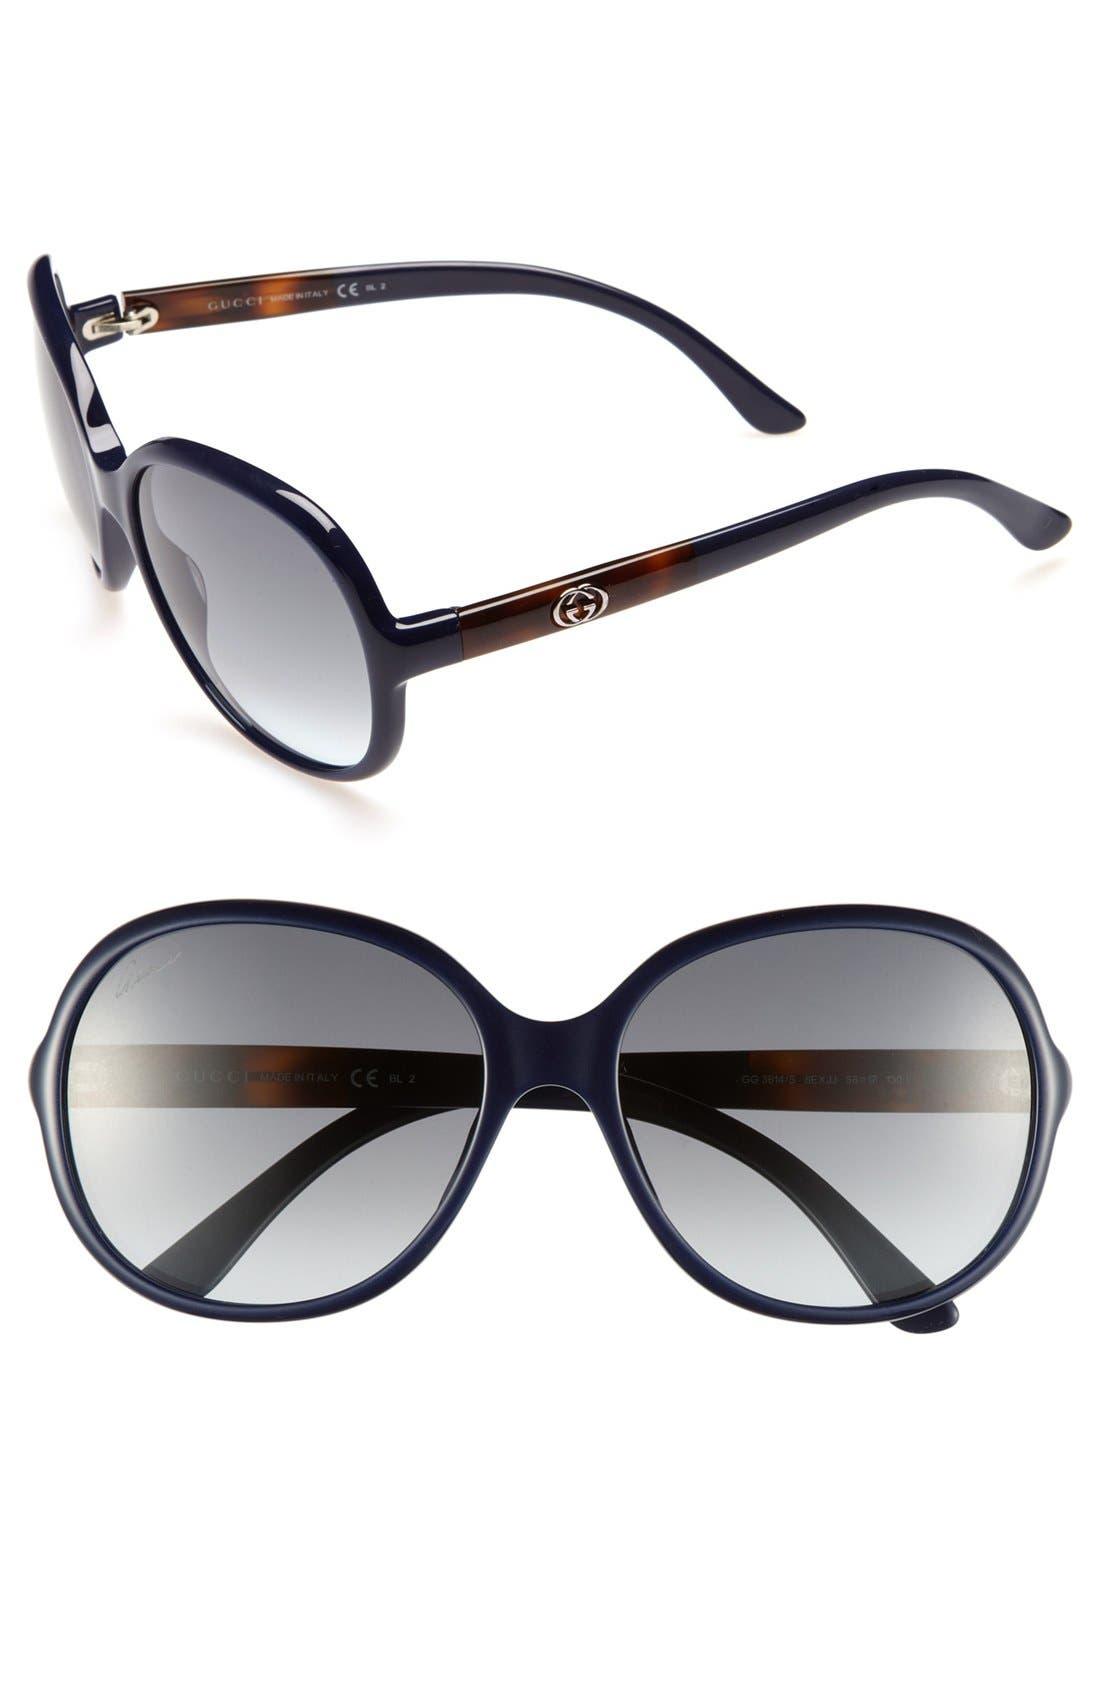 Main Image - Gucci 58mm Sunglasses